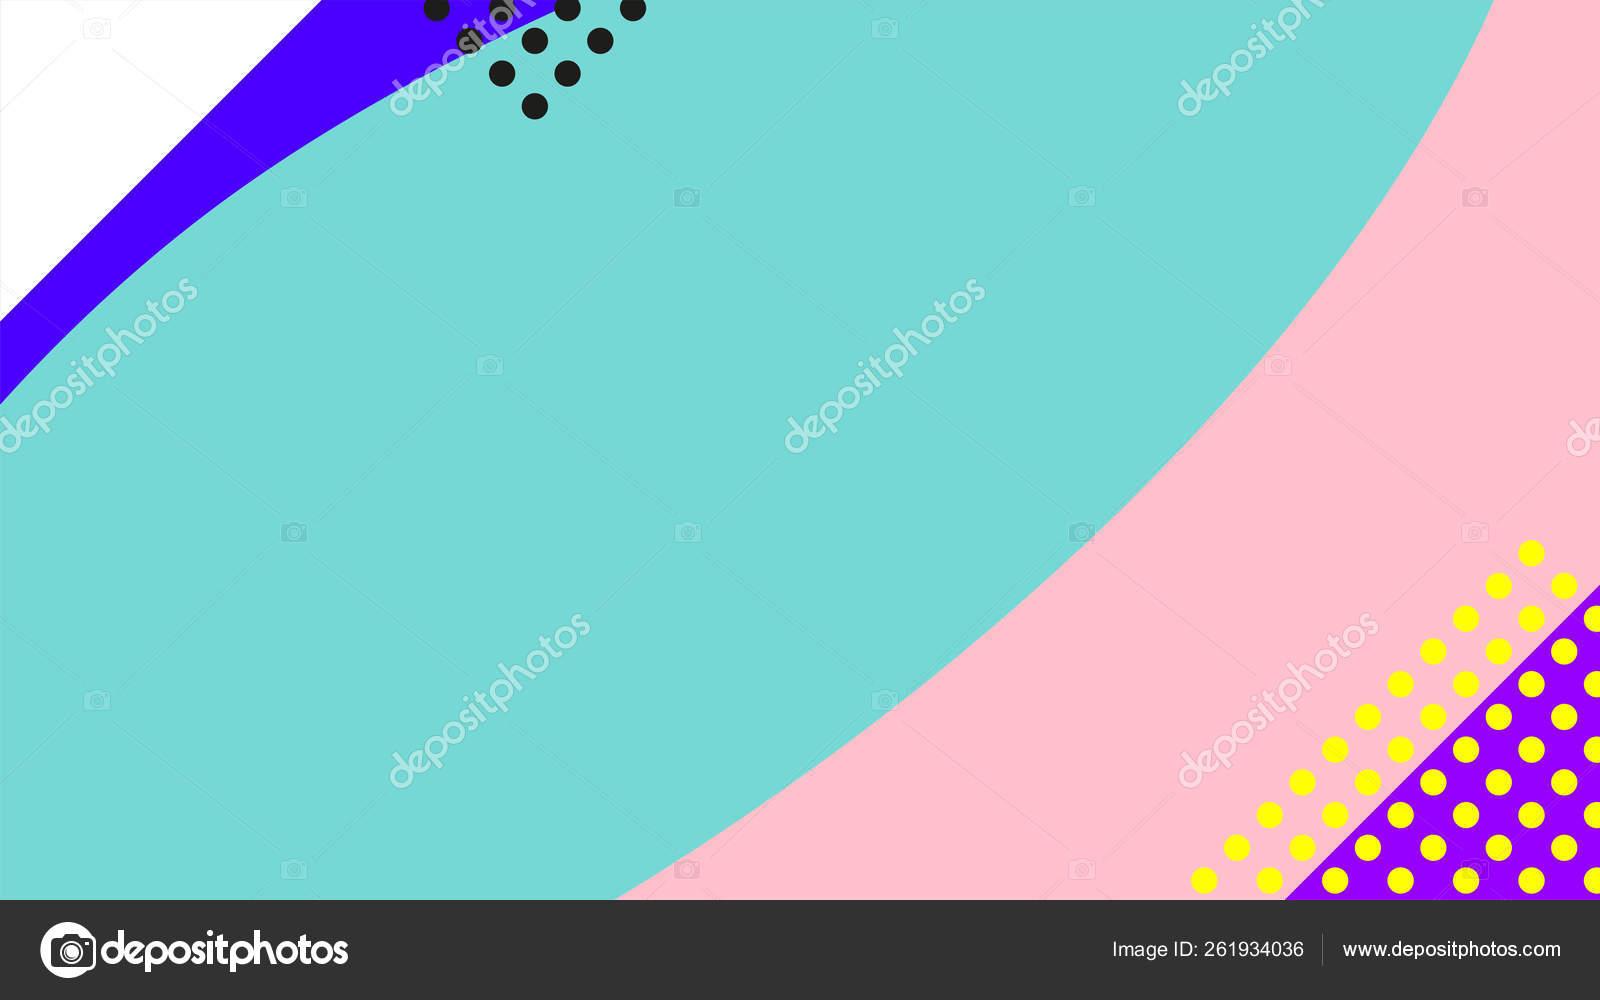 Vaporwave Retrowave Abstract Background Gradient Colorful Shaps Memphis Geometric Elements Stock Vector C V Scaperrotta 261934036